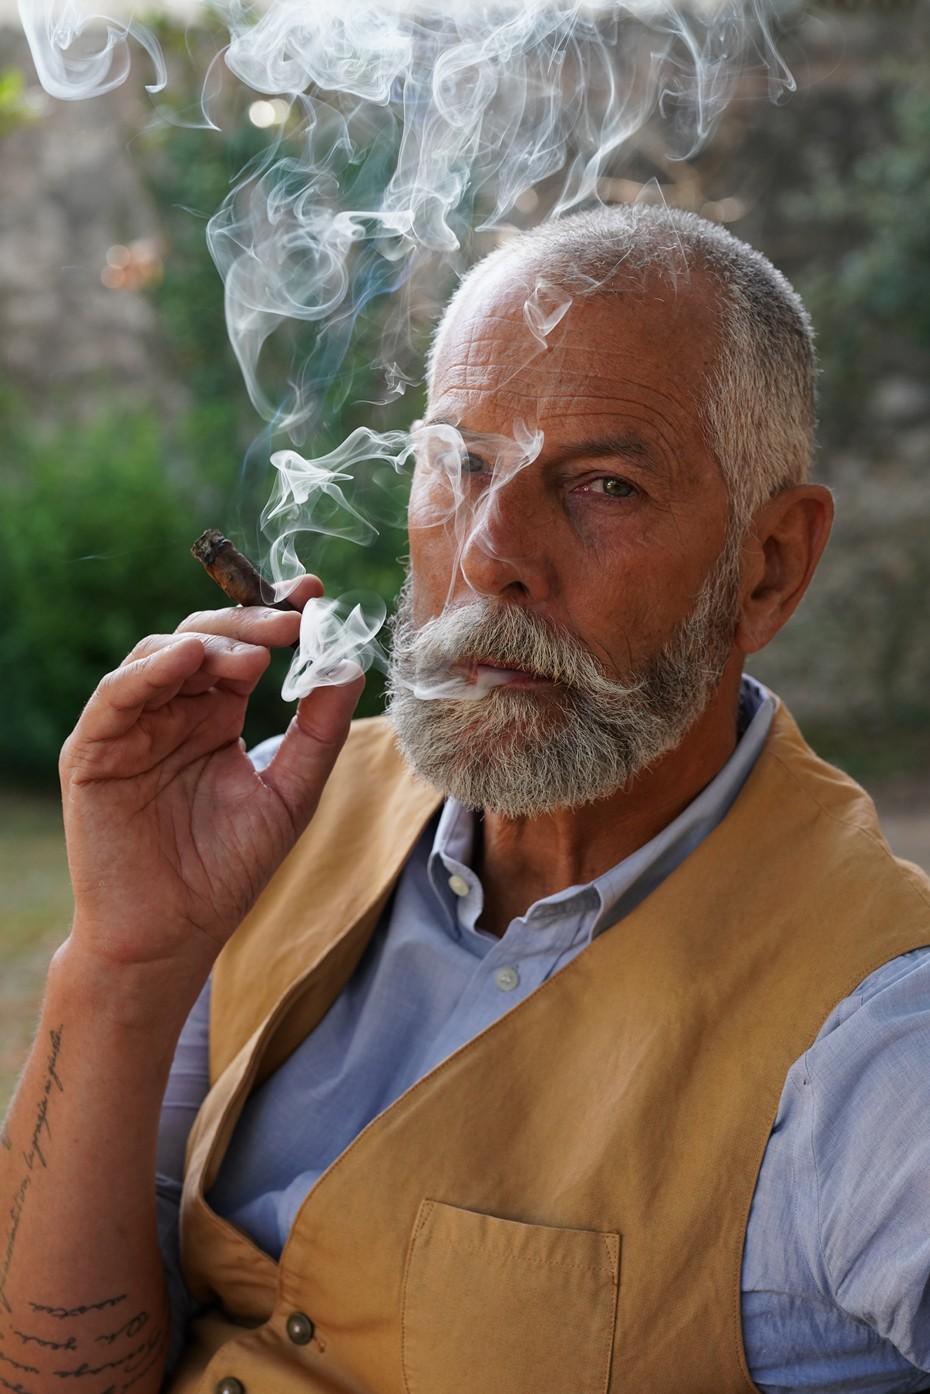 Smoking Toscano cigar, Mr. Roberto Giomi, Catador of Cigar Club Association, Lucca, Tuscany, Italy.